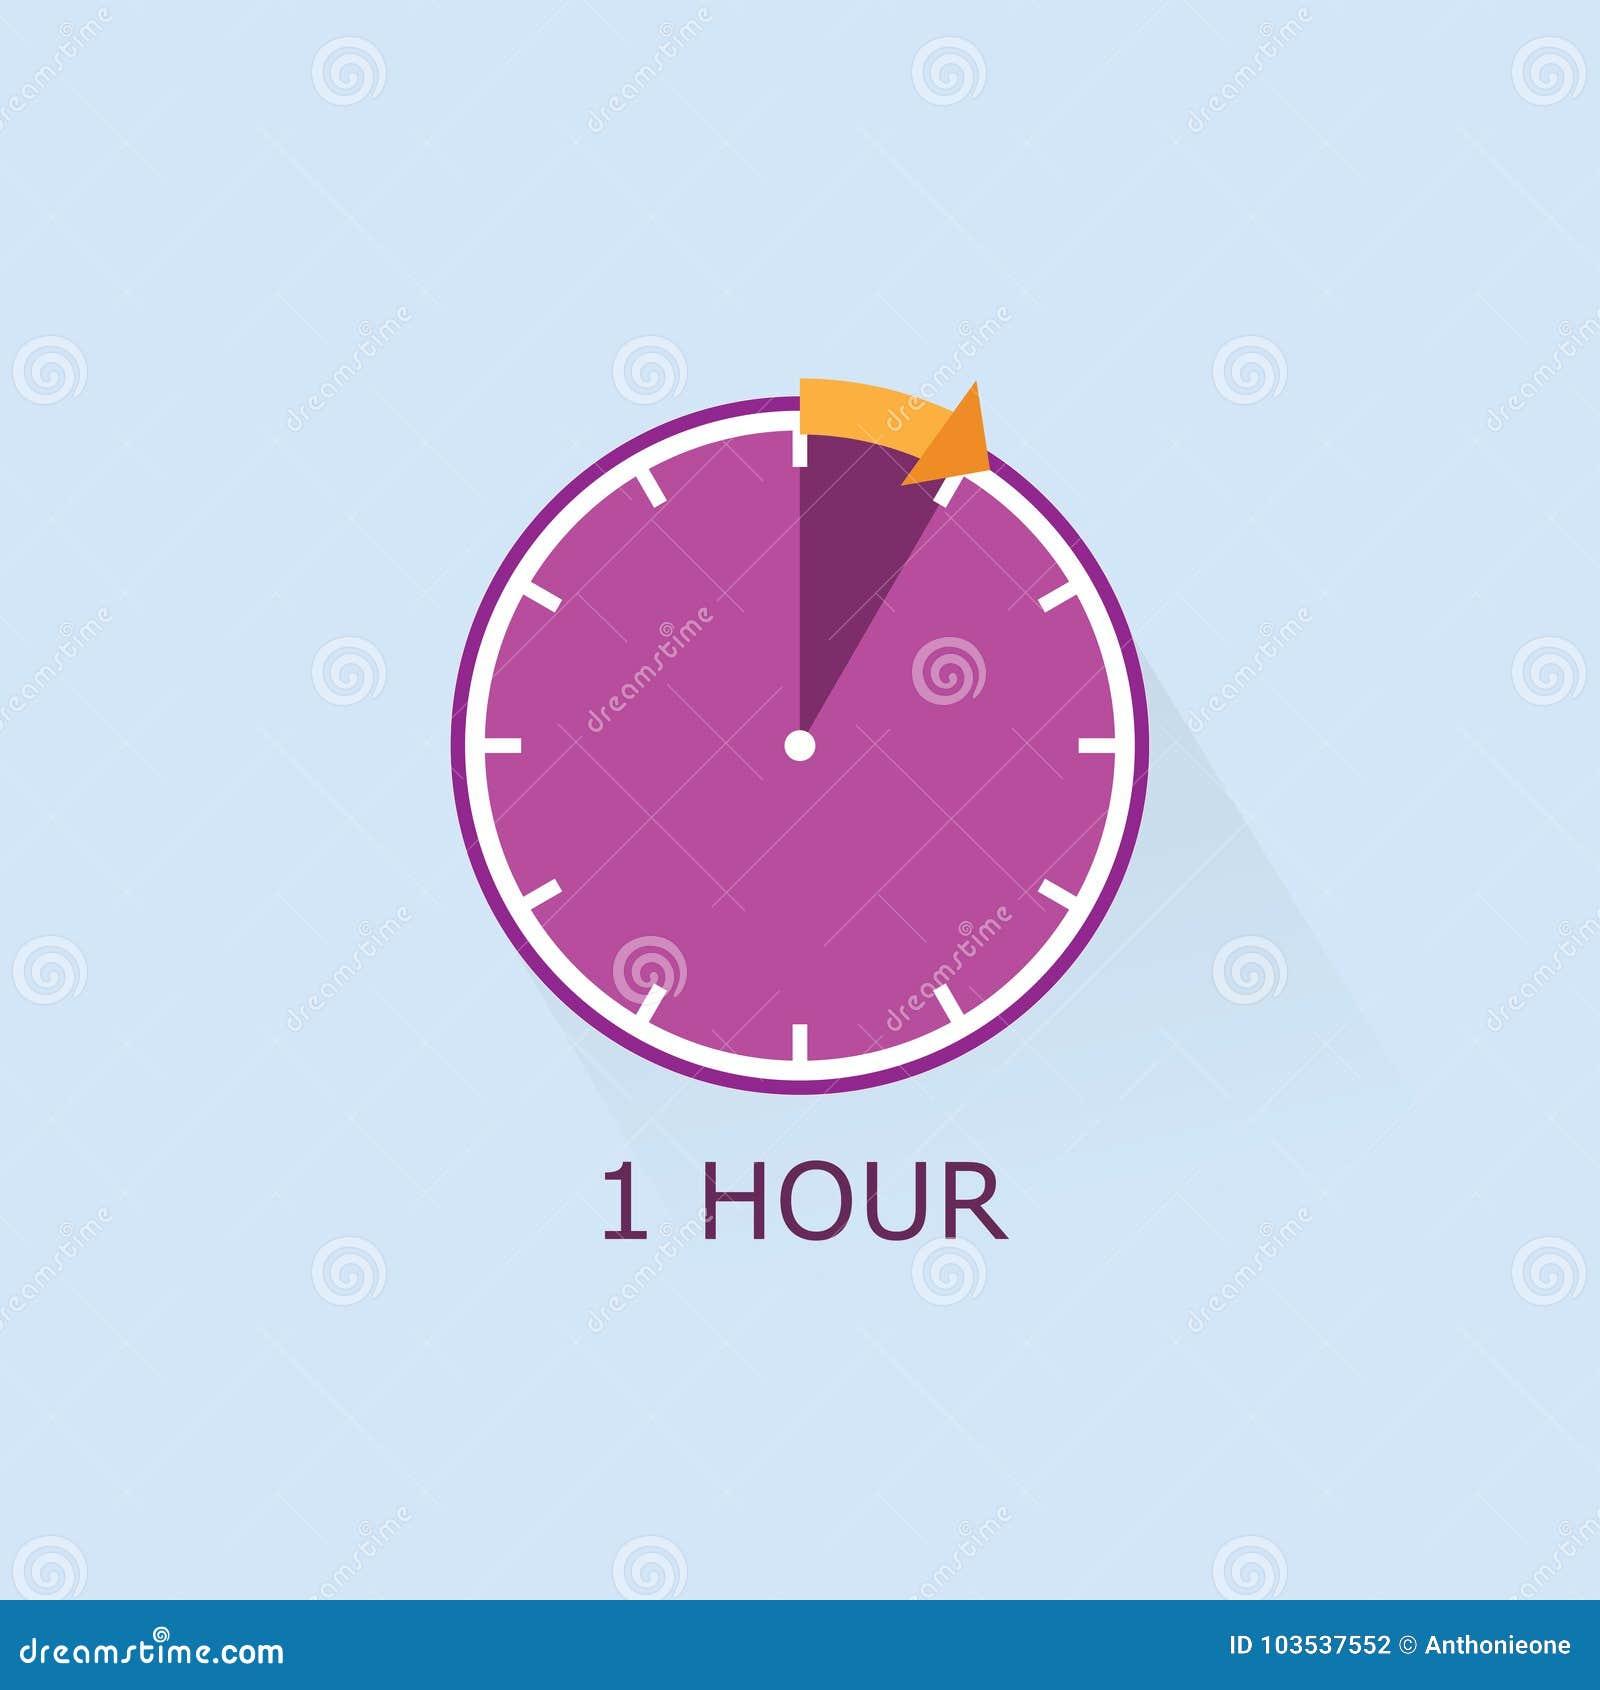 1 Hour Timer Icon With Orange Arrow Illustration On Blue Background